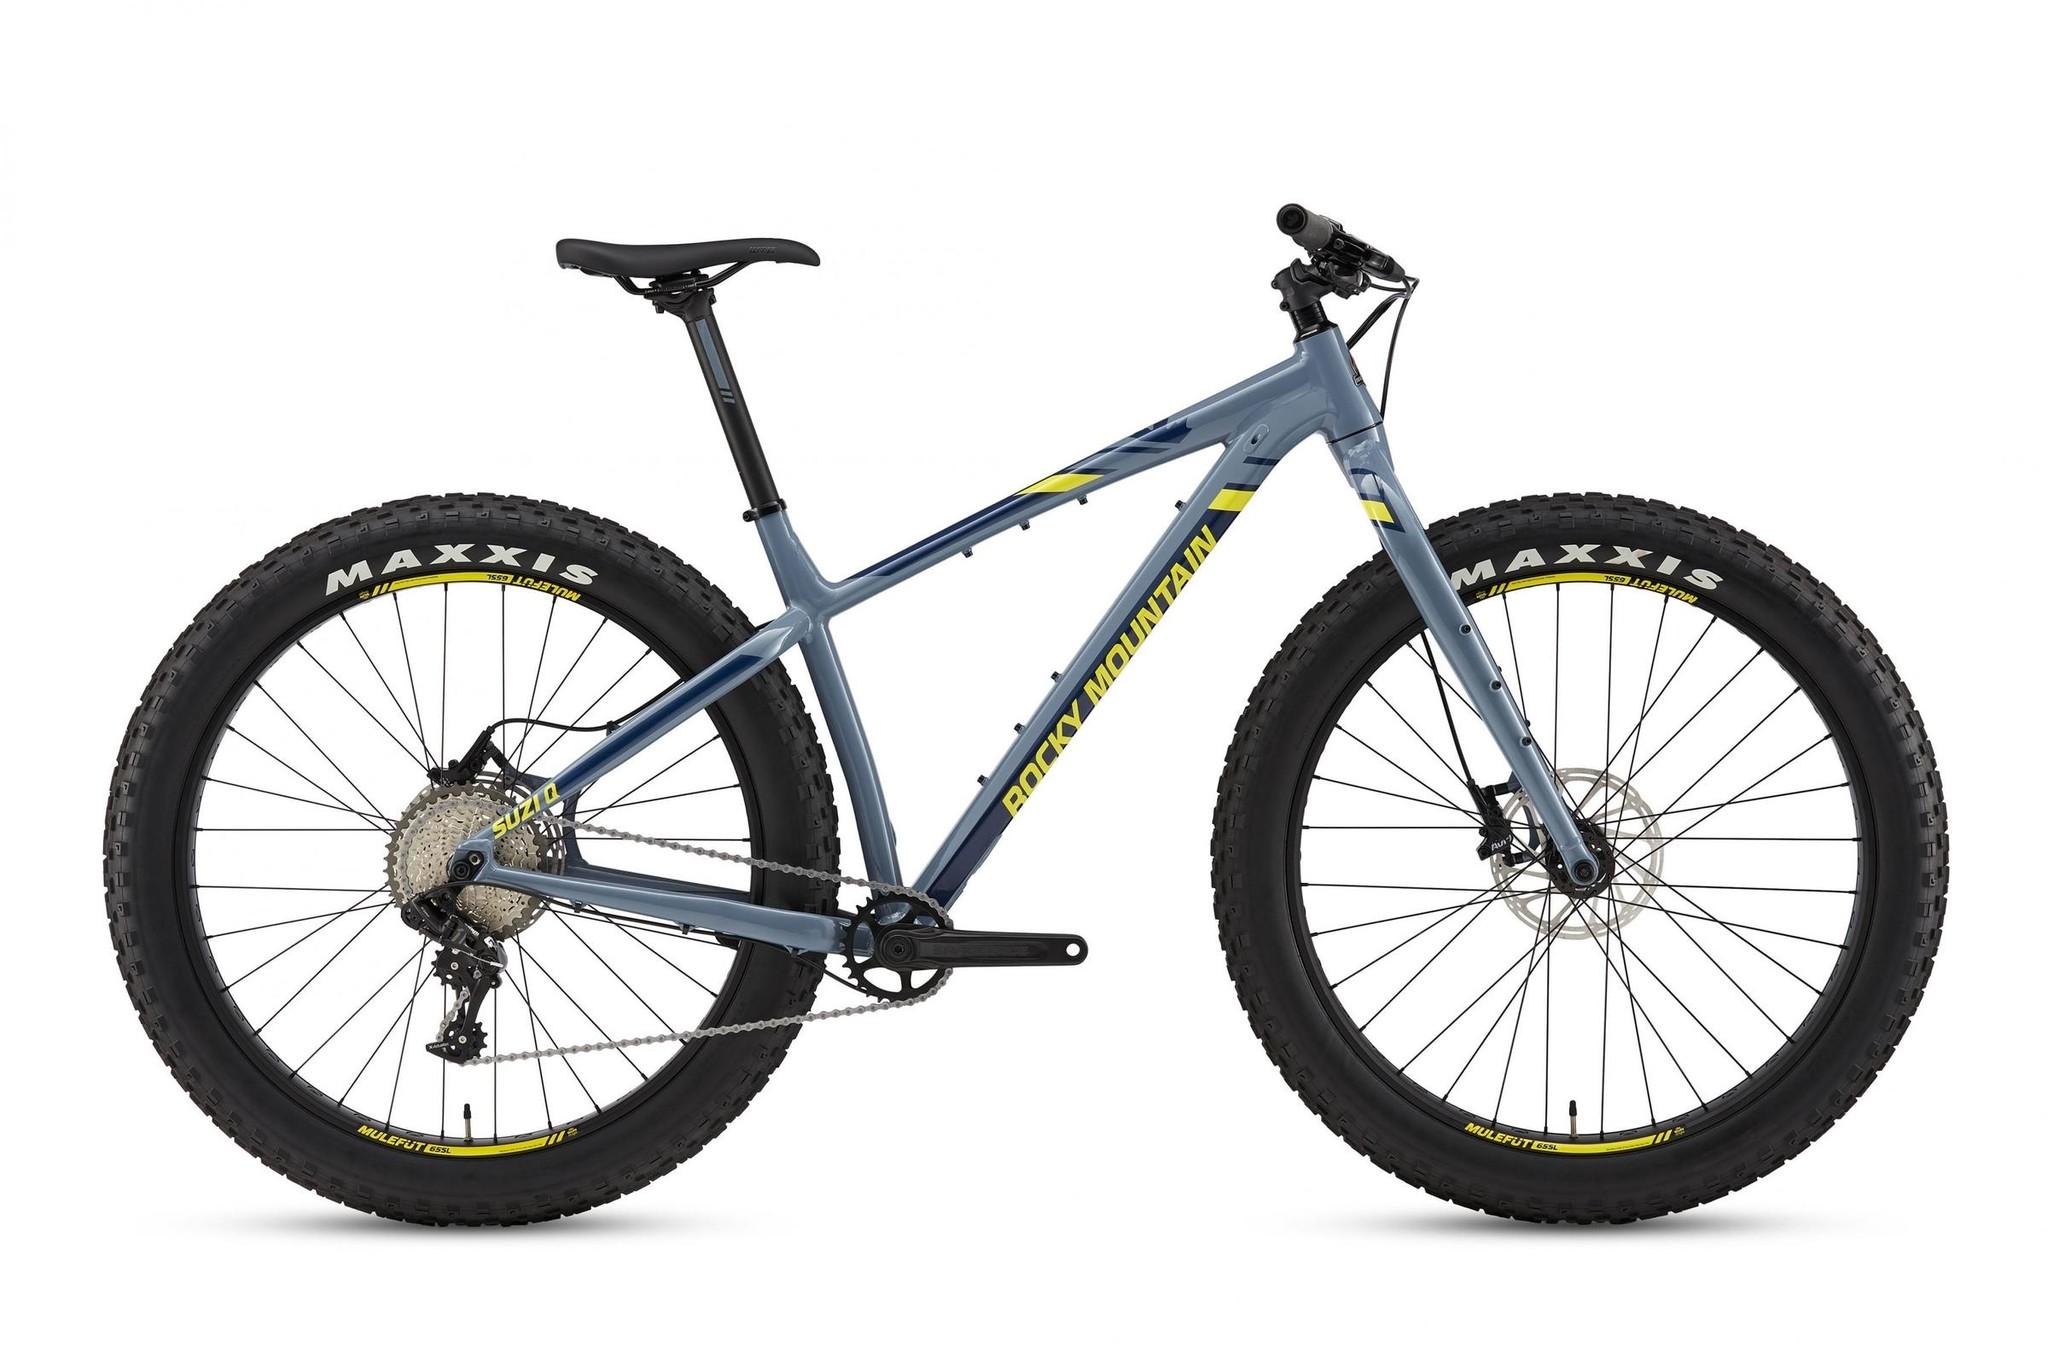 Rocky Mountain Bikes SUZI Q 30 Fat Bike